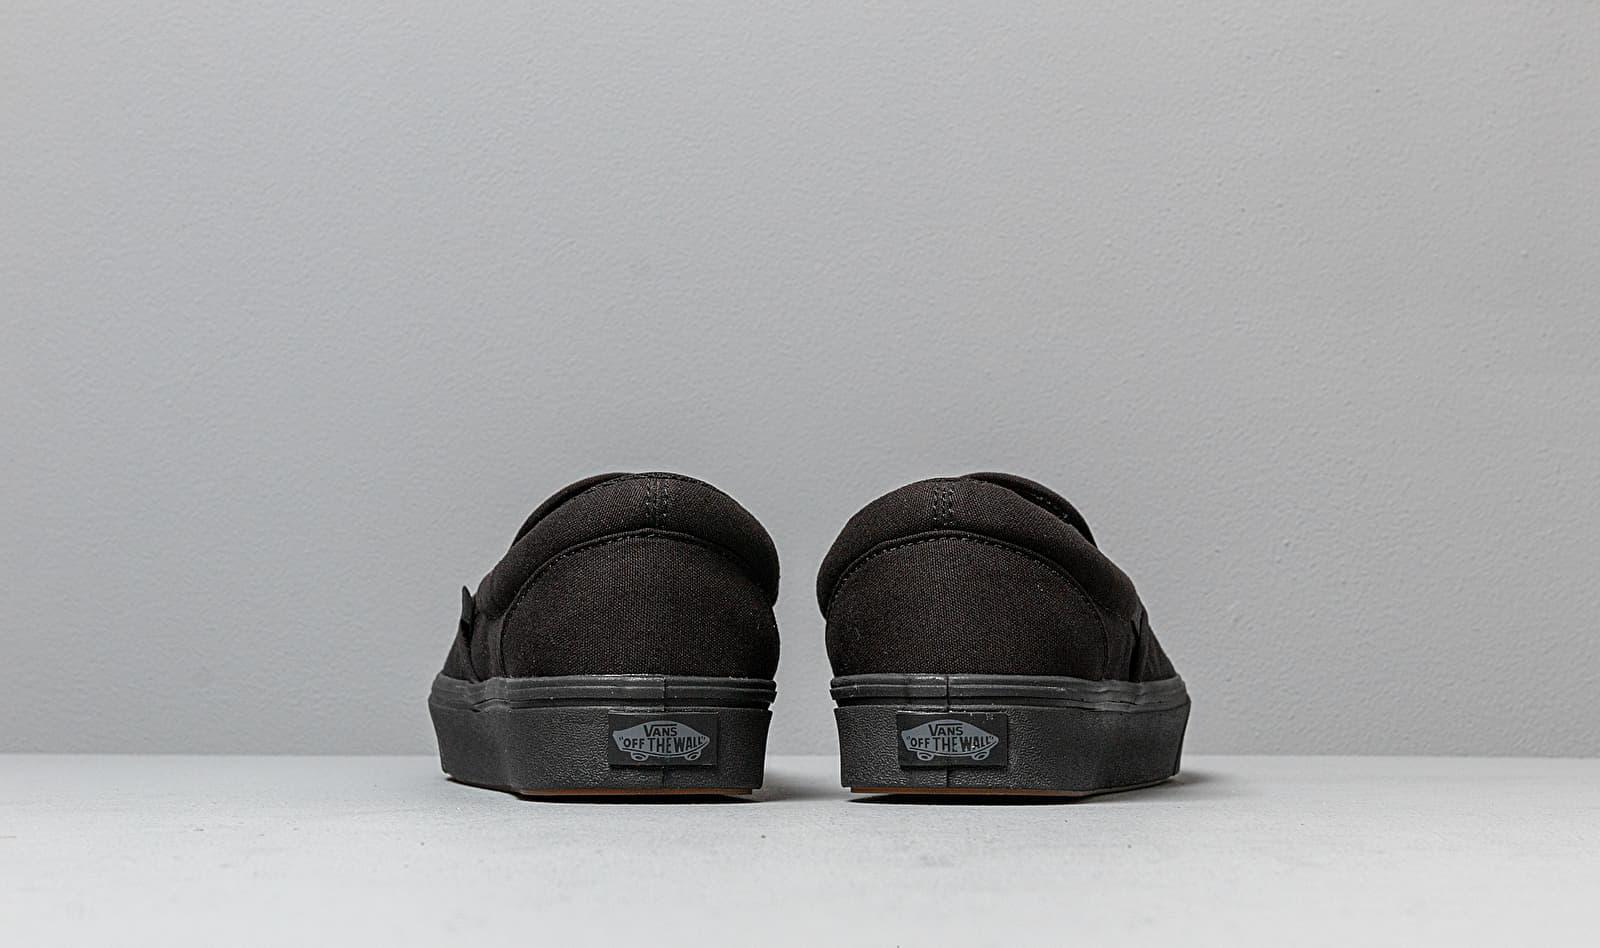 ComfyCush Slip-On (Classic) Black/ Black Vans